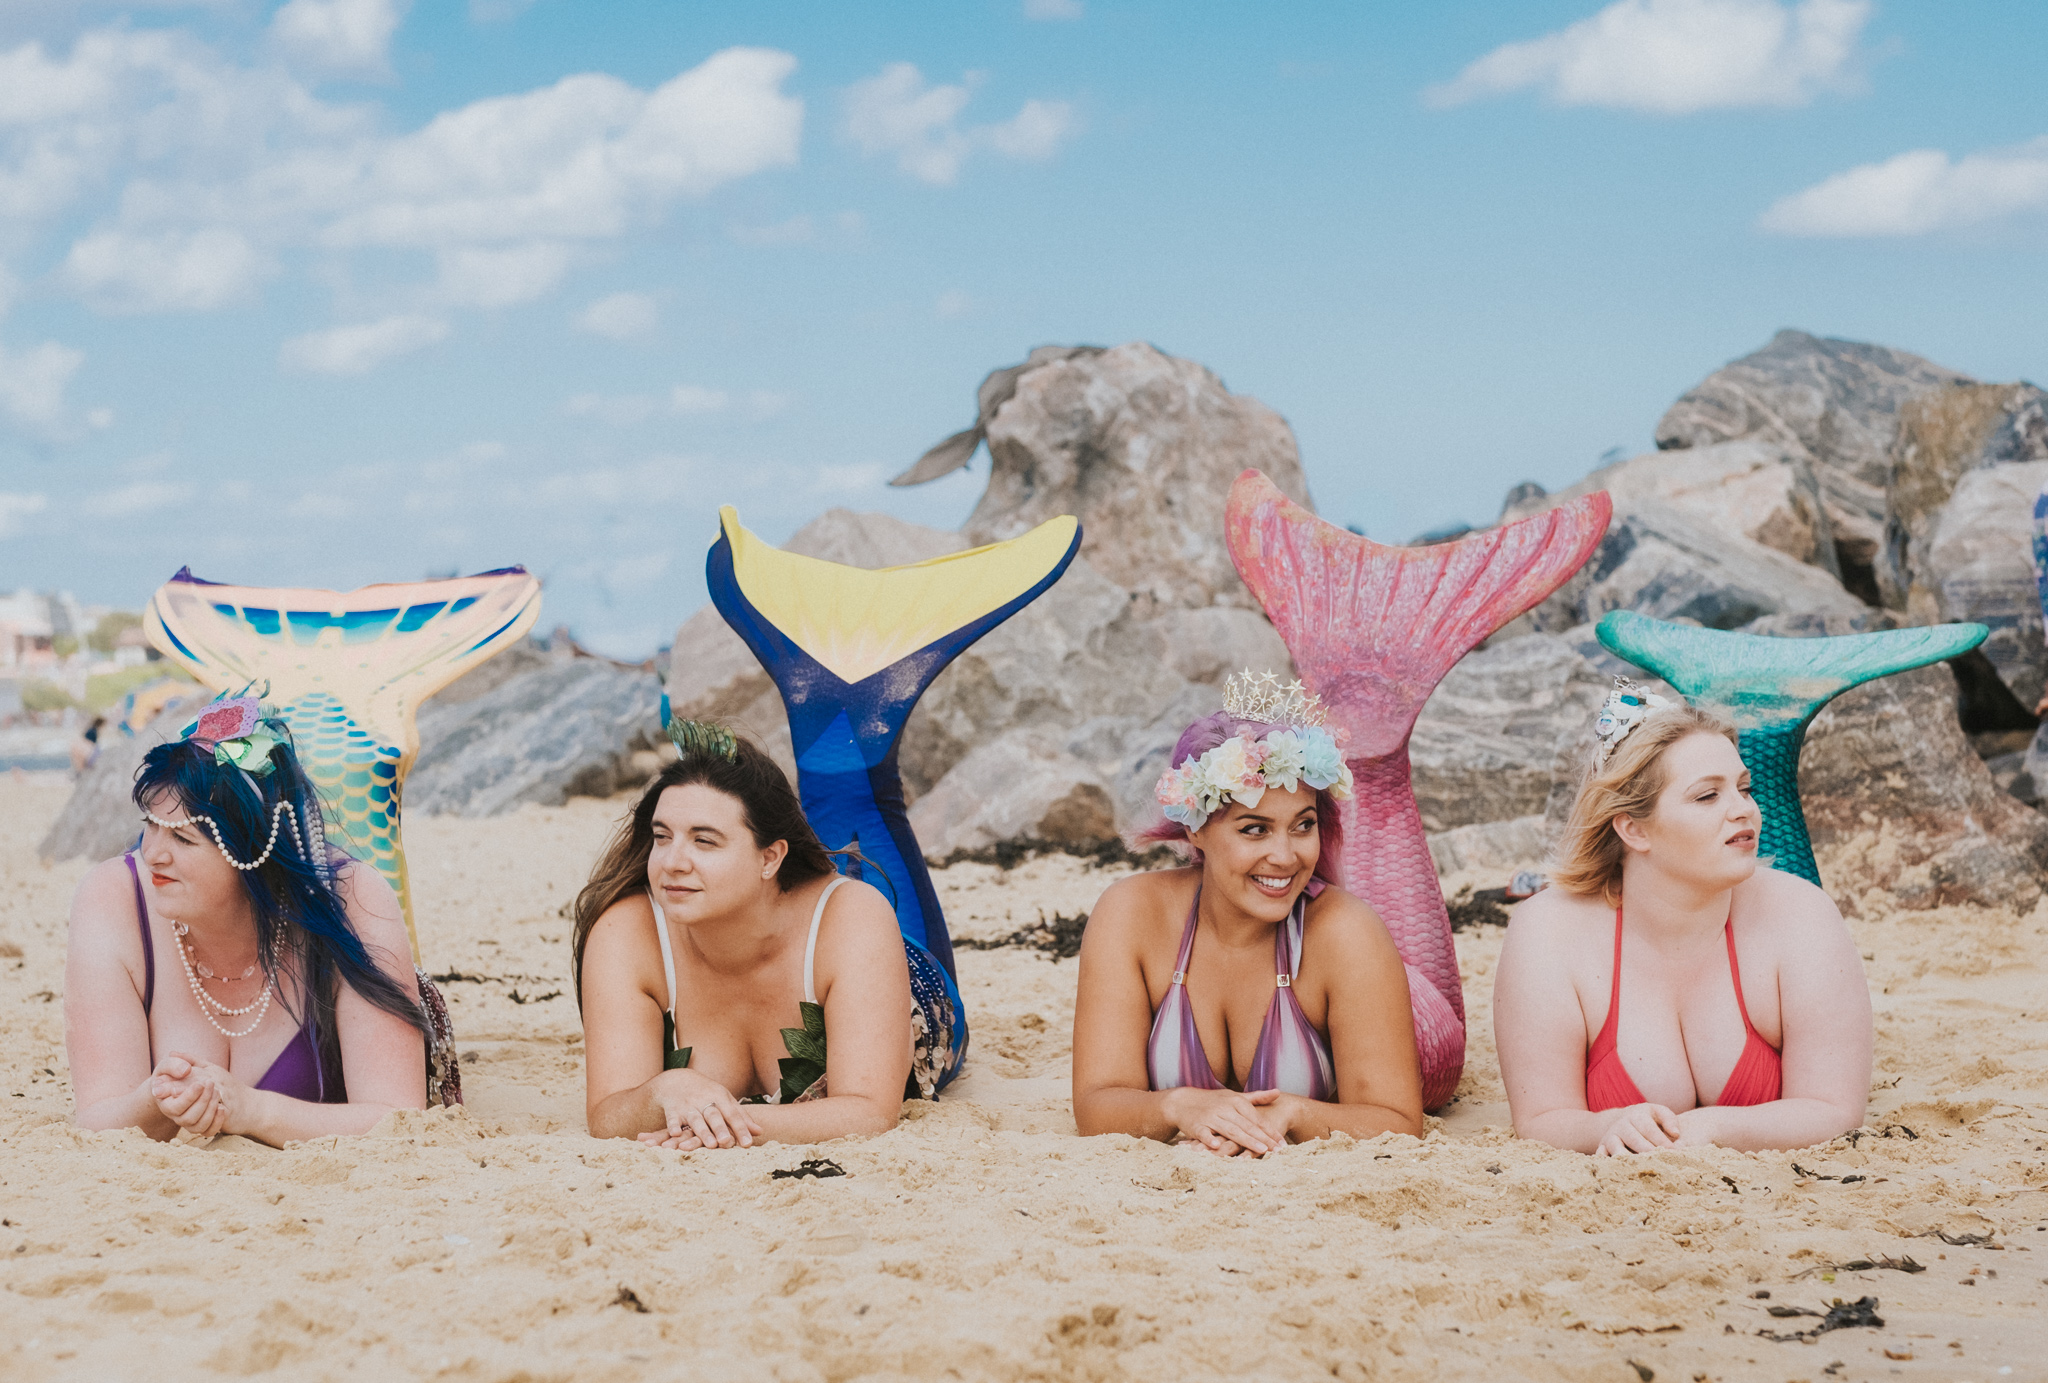 Body-Positive-Mermaids-Grace-Elizabeth-Mermaiding-UK-Alternative-Wedding-Photographer-Colchester-Essex-Suffolk-Norfolk-Devon (5 of 59).jpg